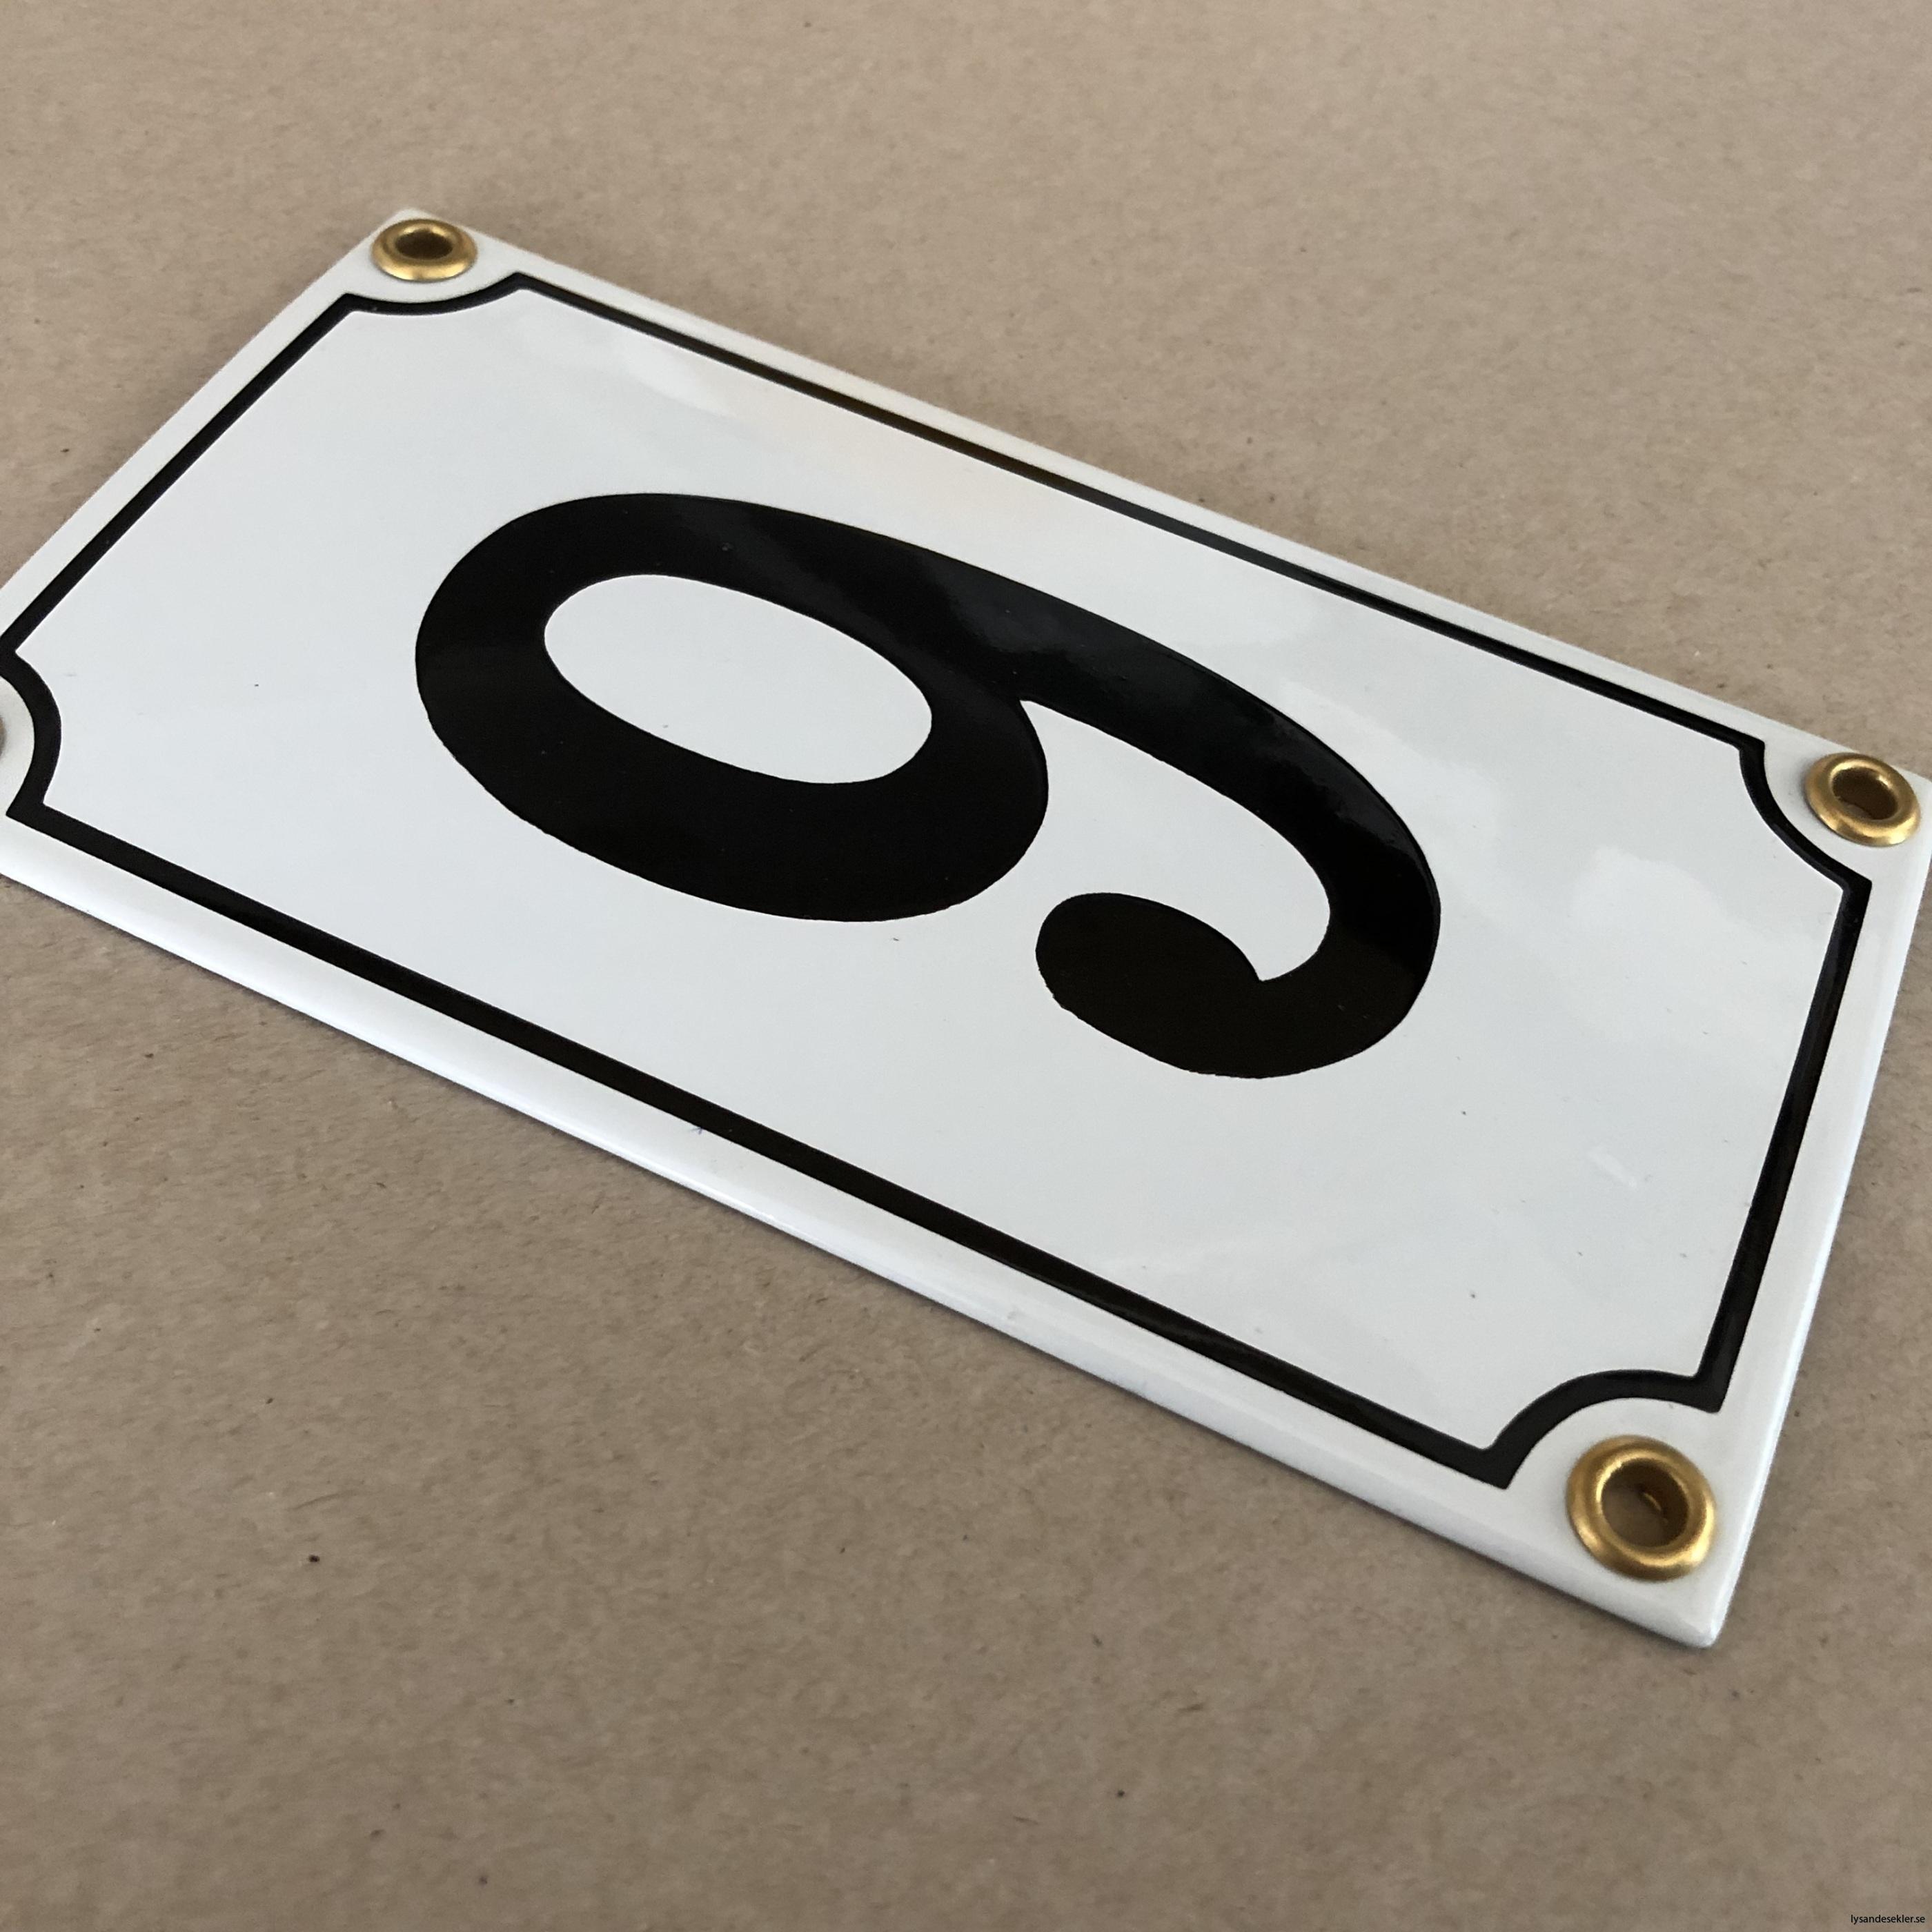 emaljsiffra siffra i emalj fasadsiffra nummer11